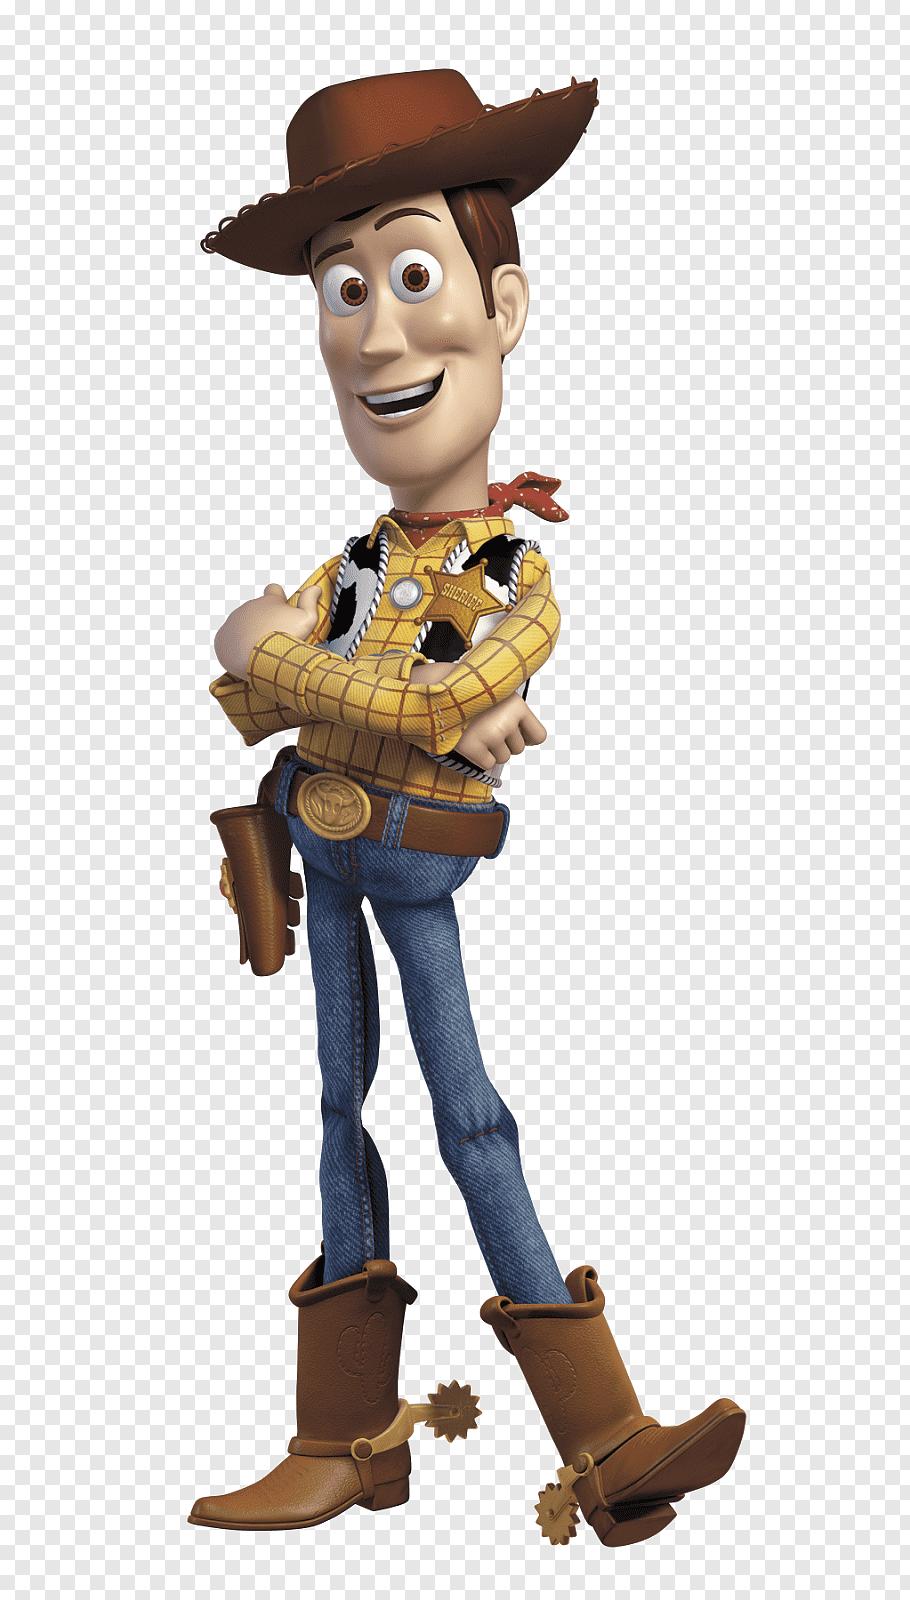 Toy Story Woody Illustration Sheriff Woody Buzz Lightyear Jessie Toy Story 3 Toy Story Free Png Jessie Toy Story Woody Toy Story Toy Story Costumes